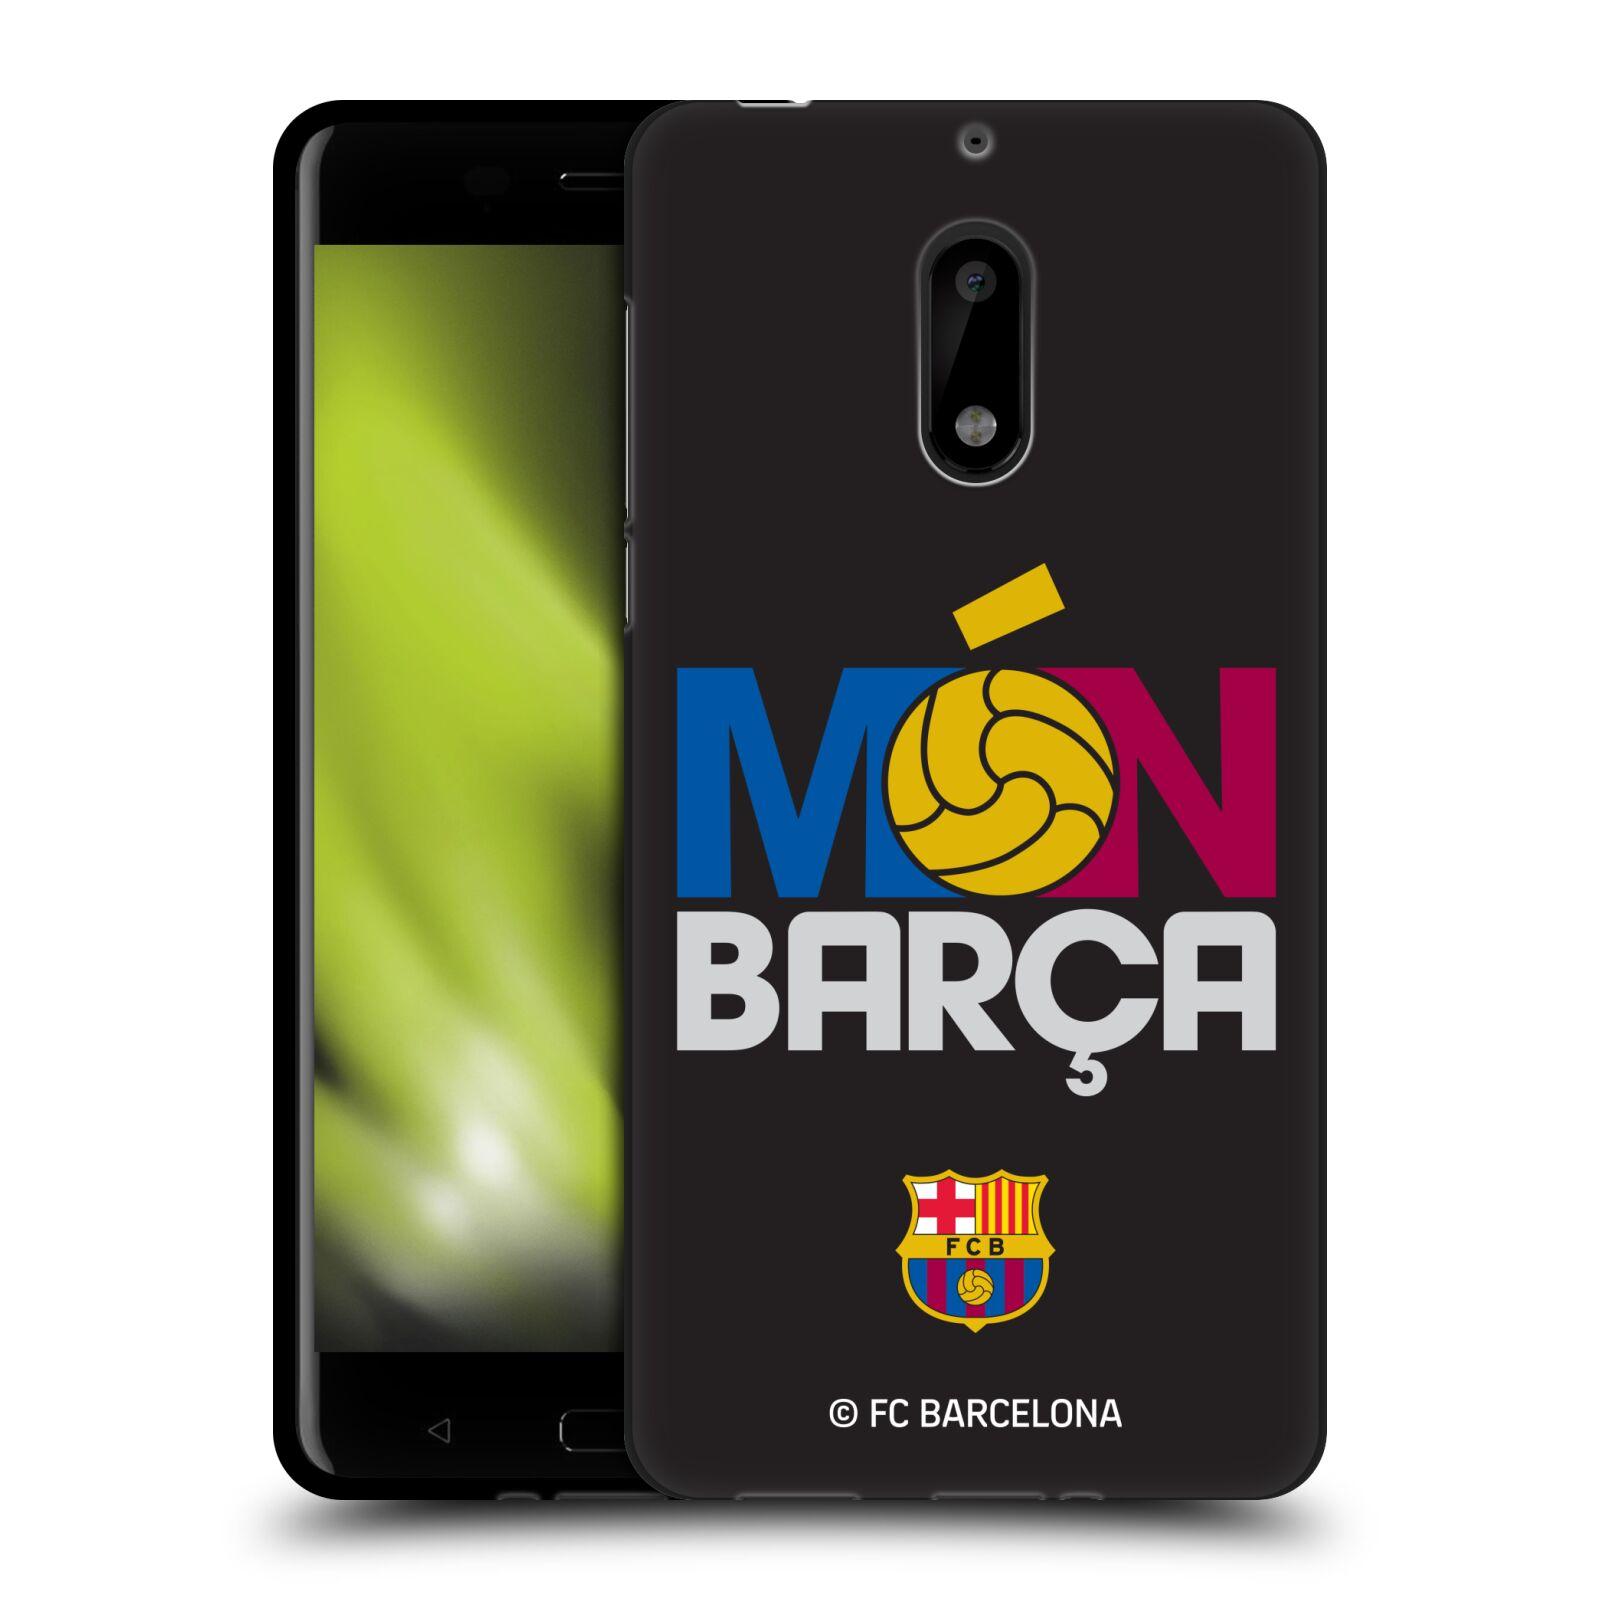 OFFICIAL-FC-BARCELONA-2017-18-CAMPIONS-BLACK-GEL-CASE-FOR-MICROSOFT-NOKIA-PHONES